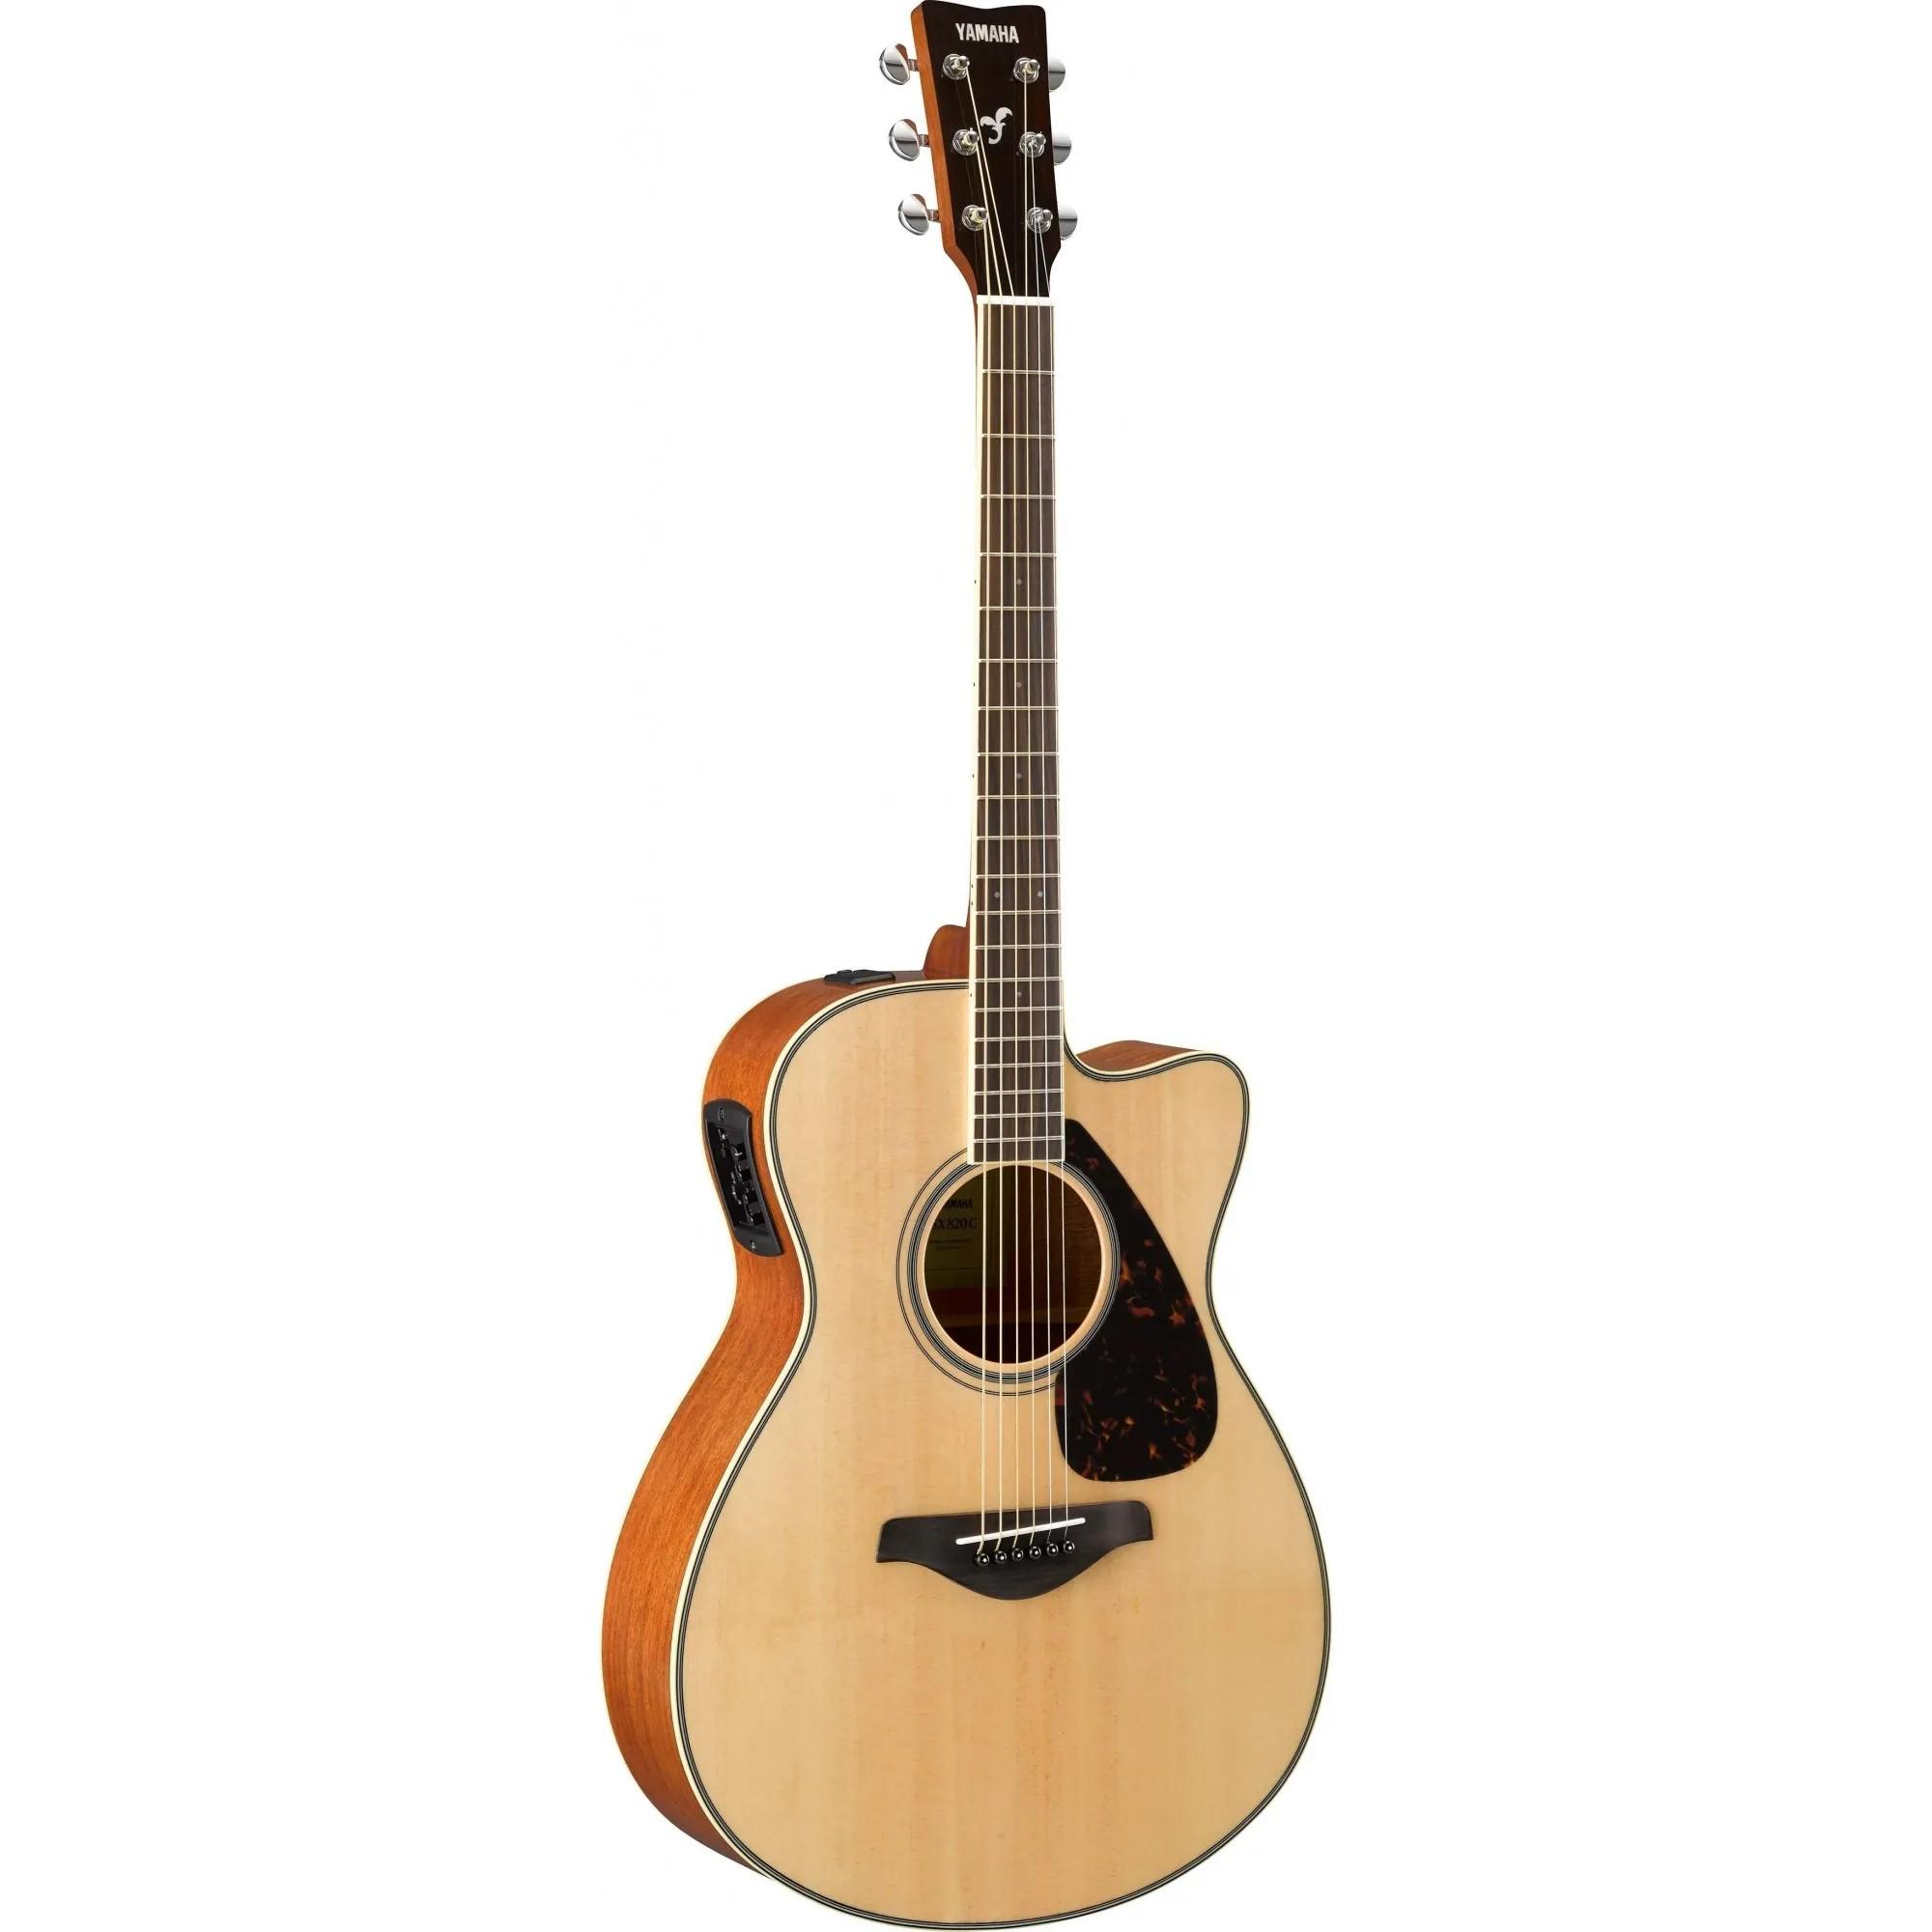 Violão Yamaha FSX820C - Natural